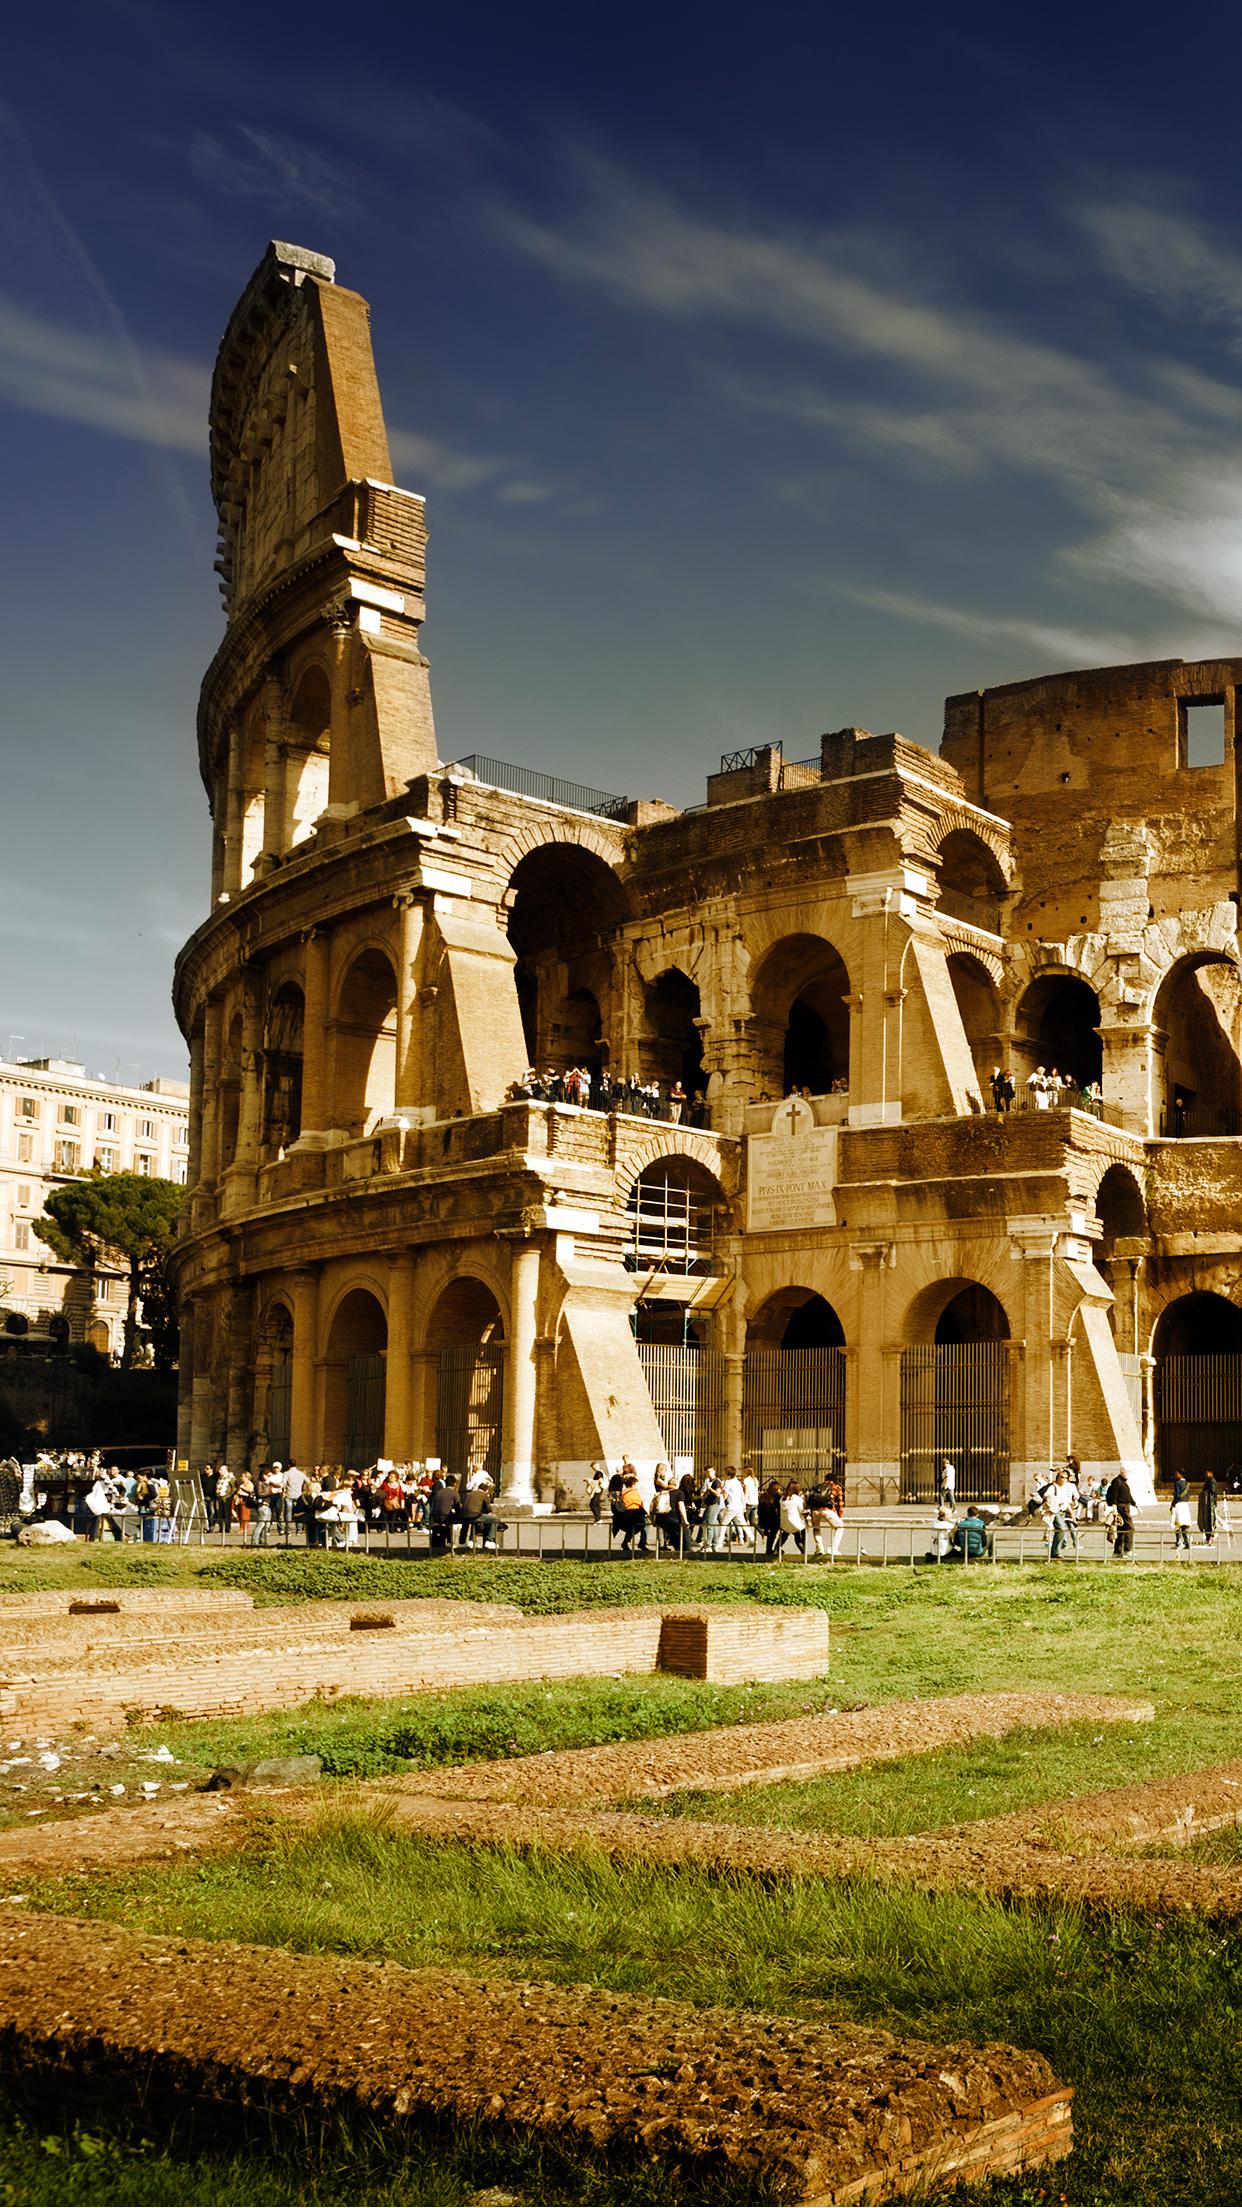 Italia Colosseum 3Wallpapers Parallax iPhone Italia Colosseum